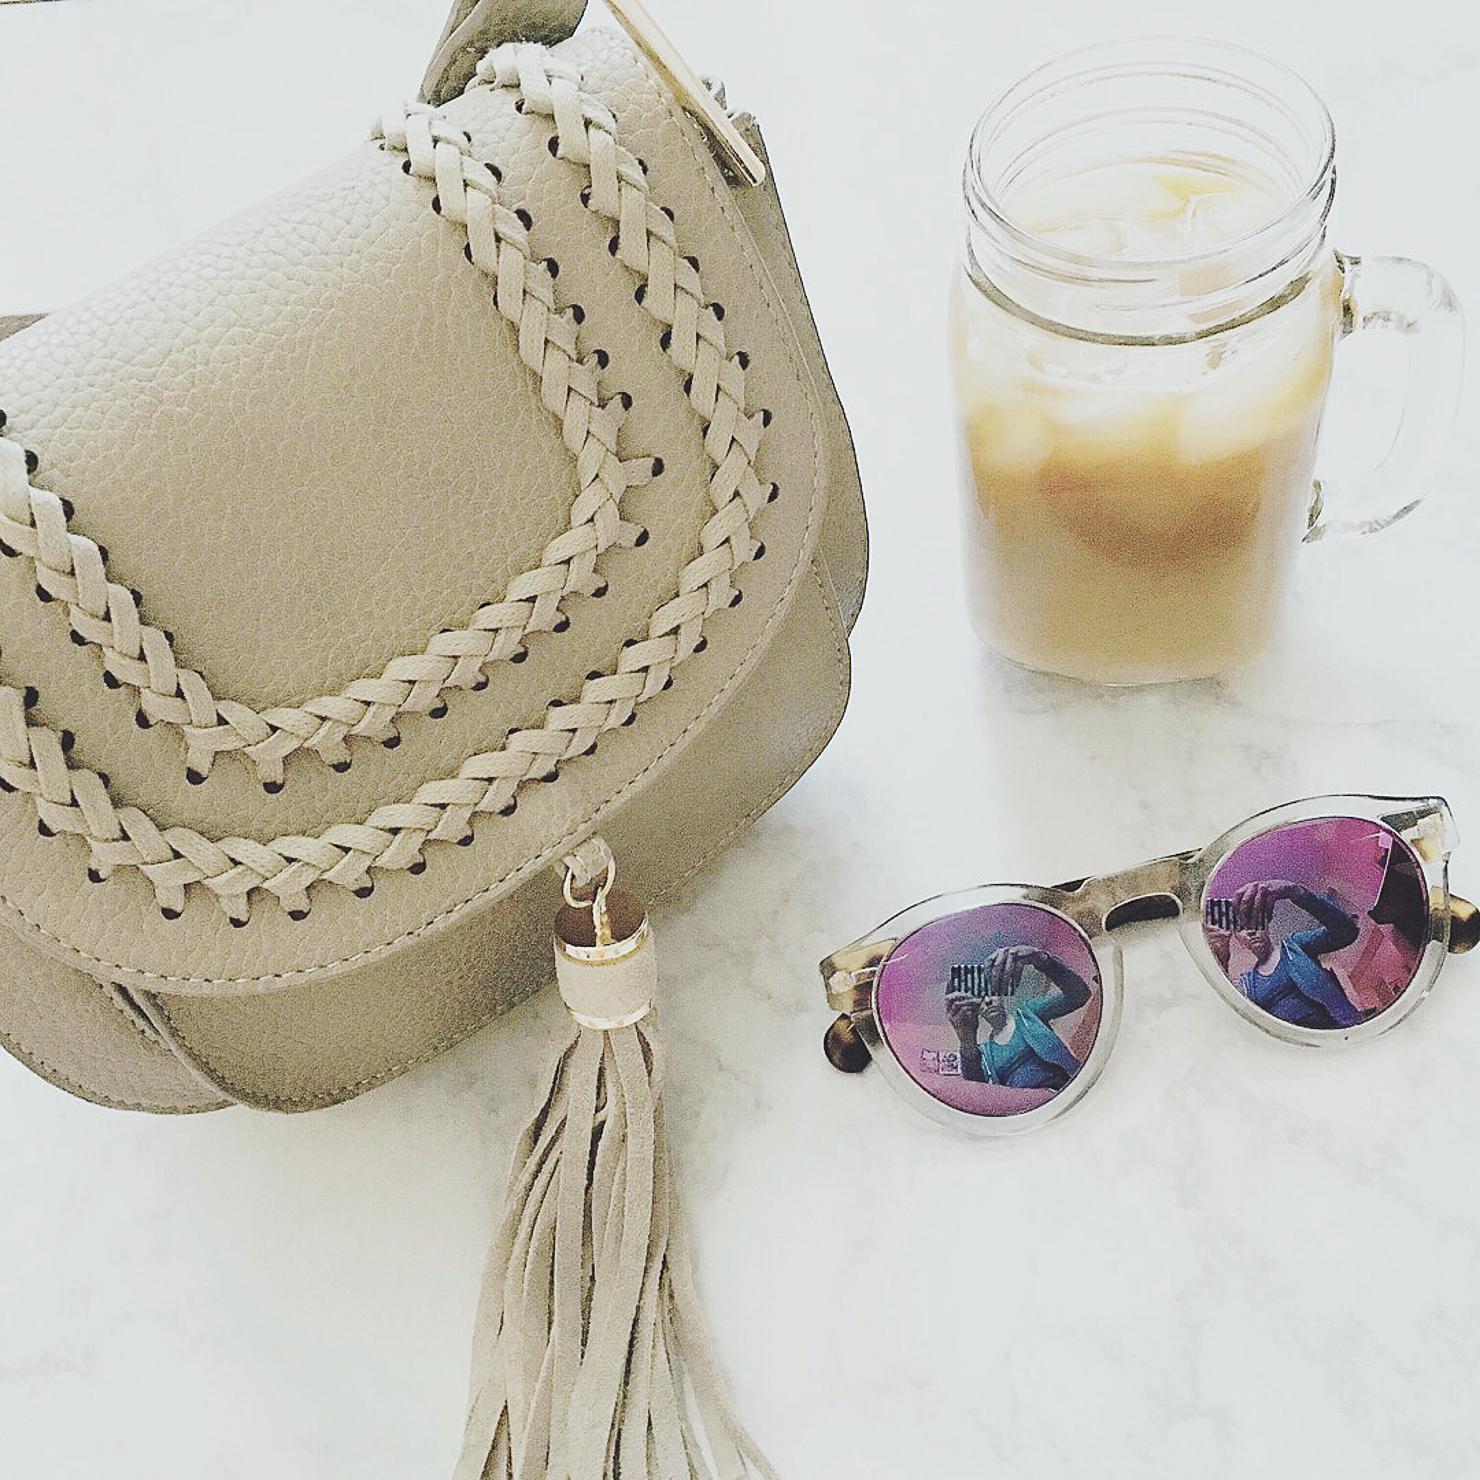 grey-chloe-hudson-dupe-chloe-look-for-less-illesteva-leonard-sunglasses-iced-coffee